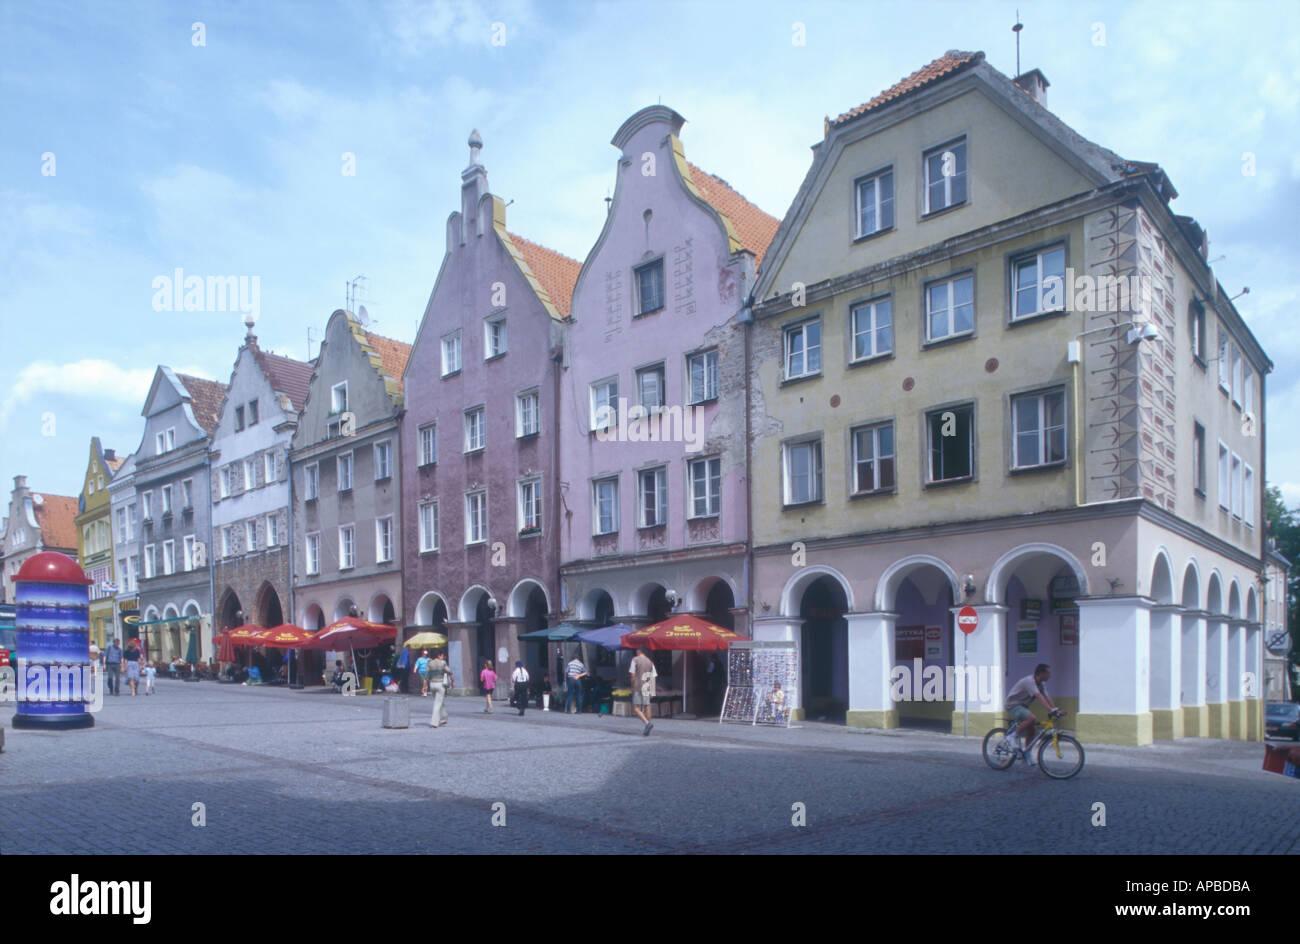 row of medieval house facades old town centre market square Olsztyn Mazuria Poland  - Stock Image